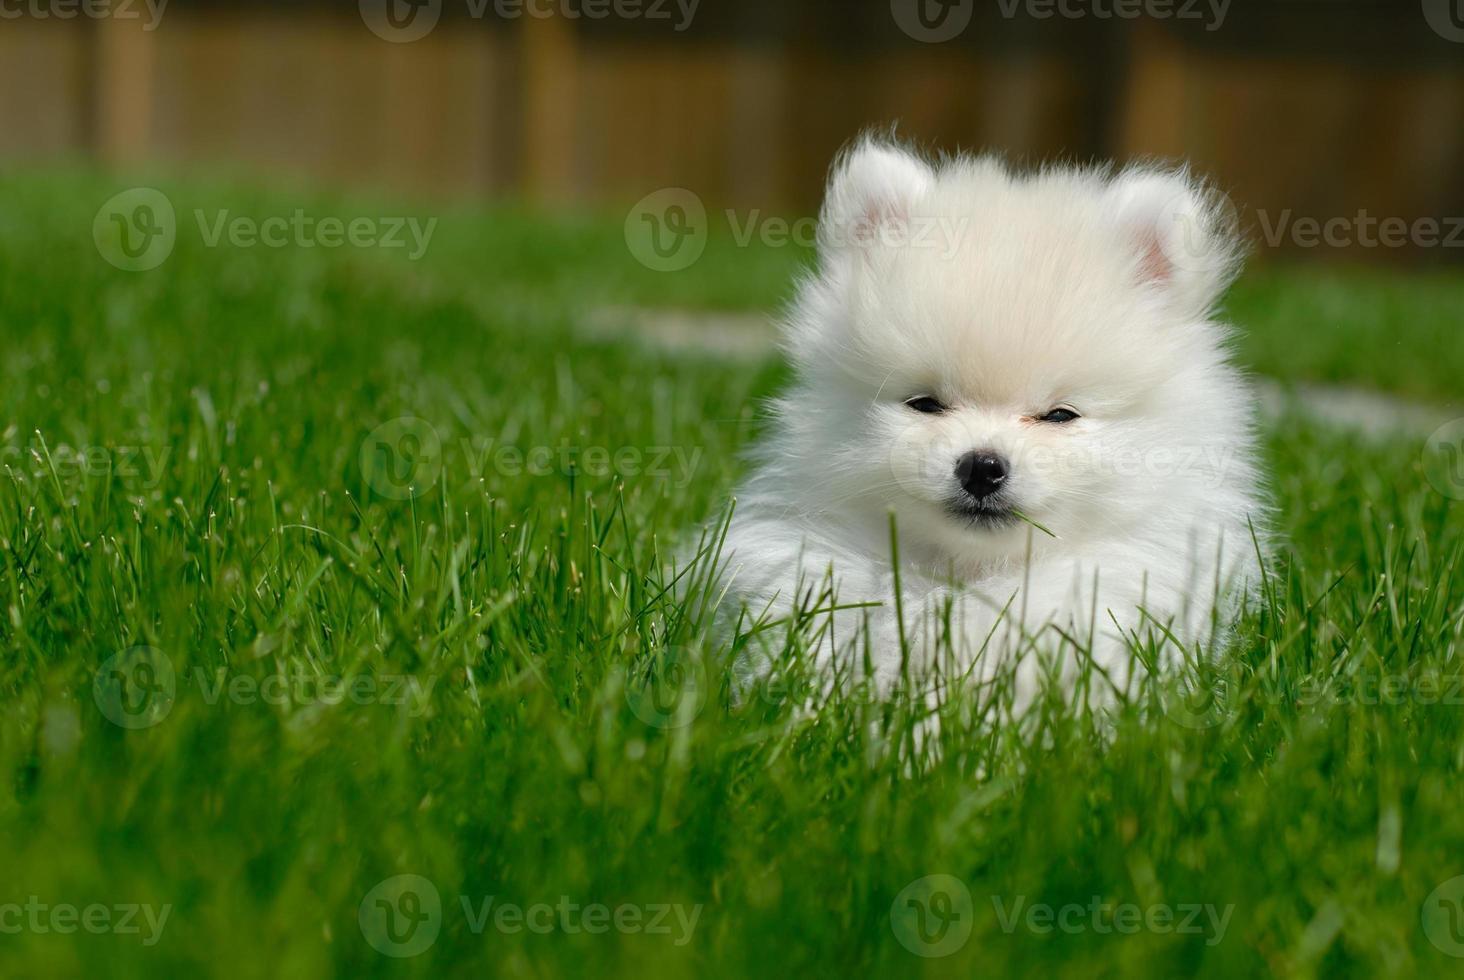 vit pomeranian valp på gräsmattan foto